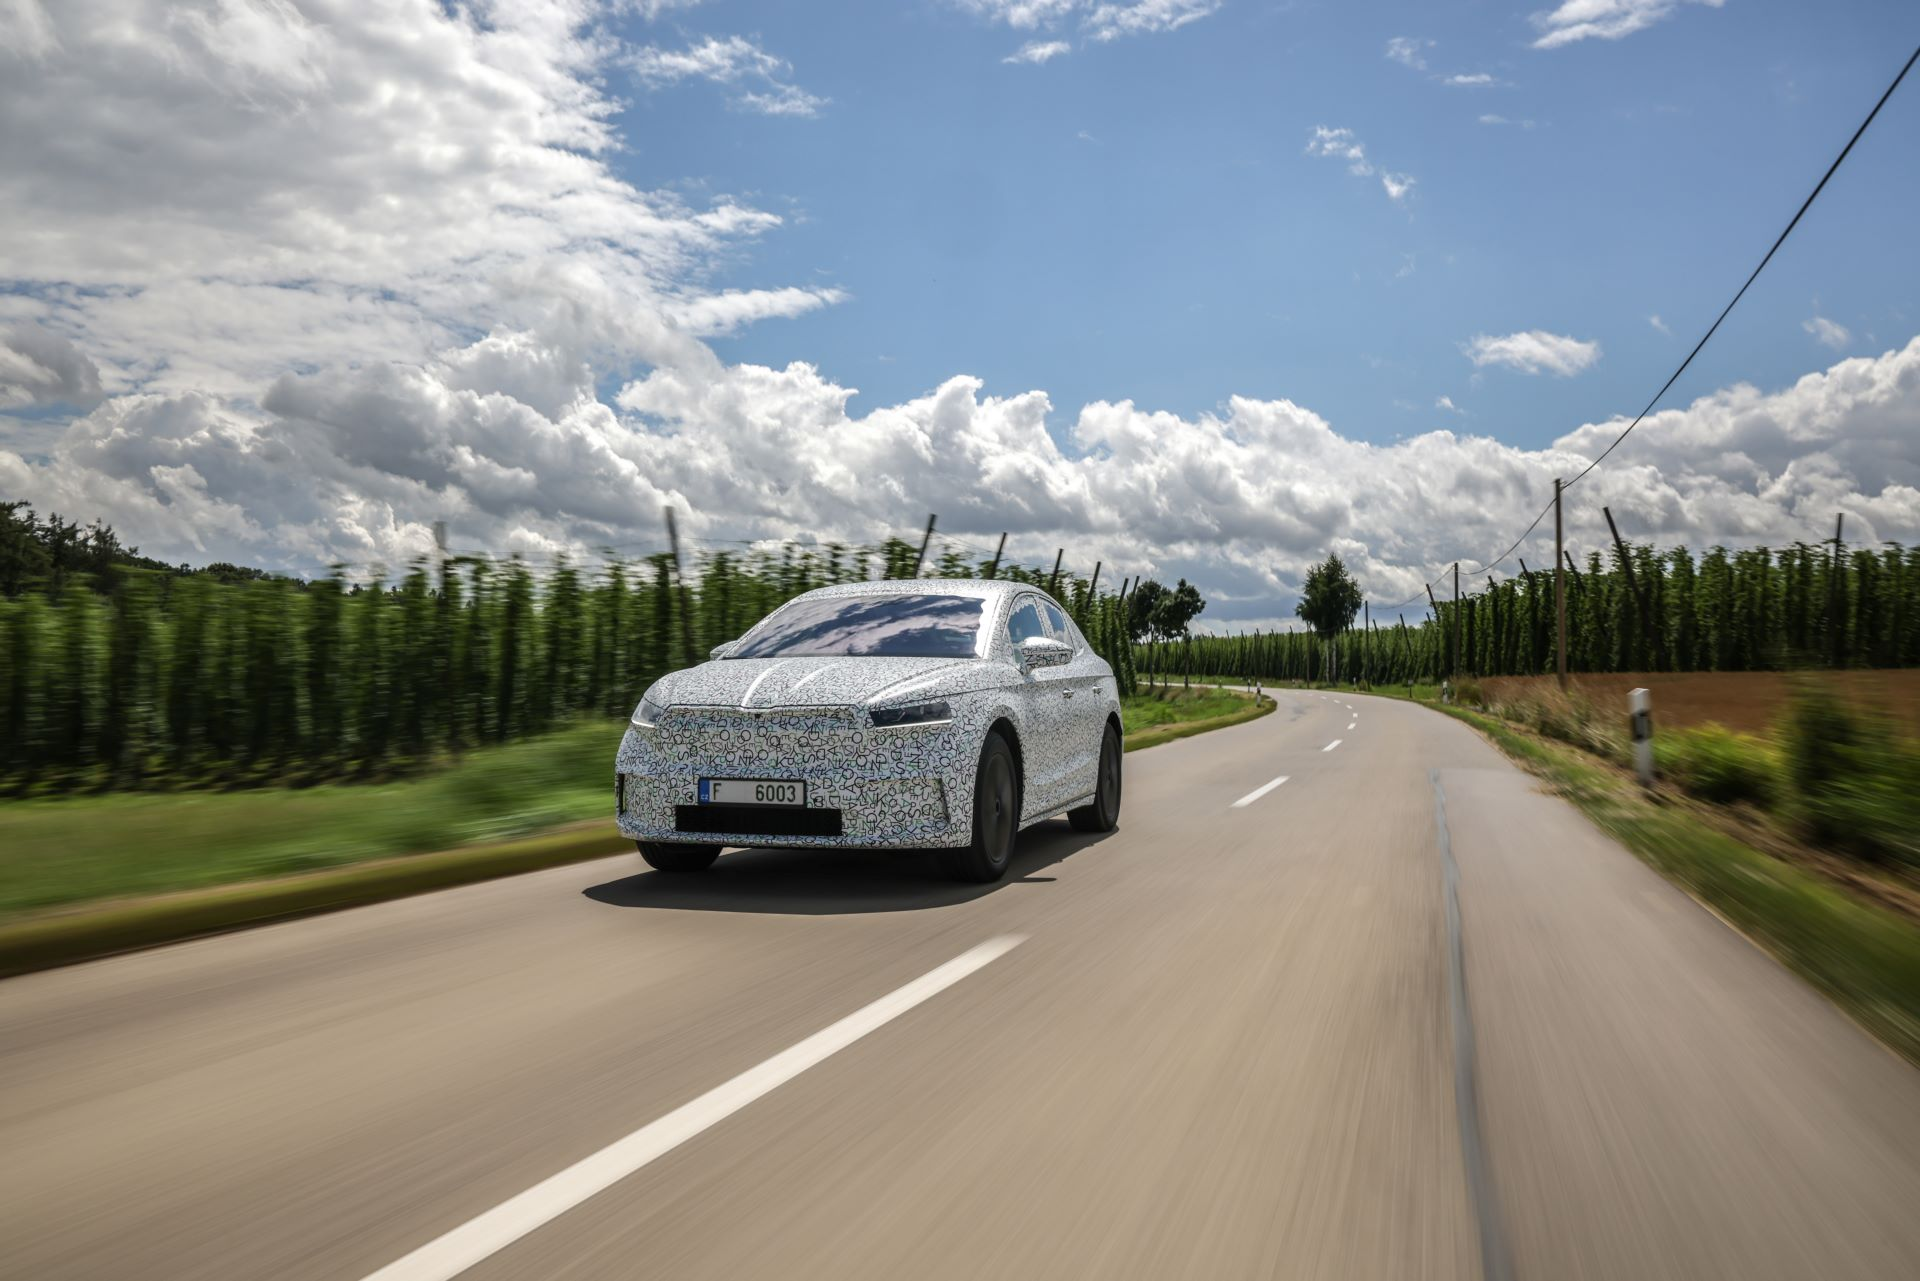 Skoda-Enyaq-Coupe-iV-specs-35